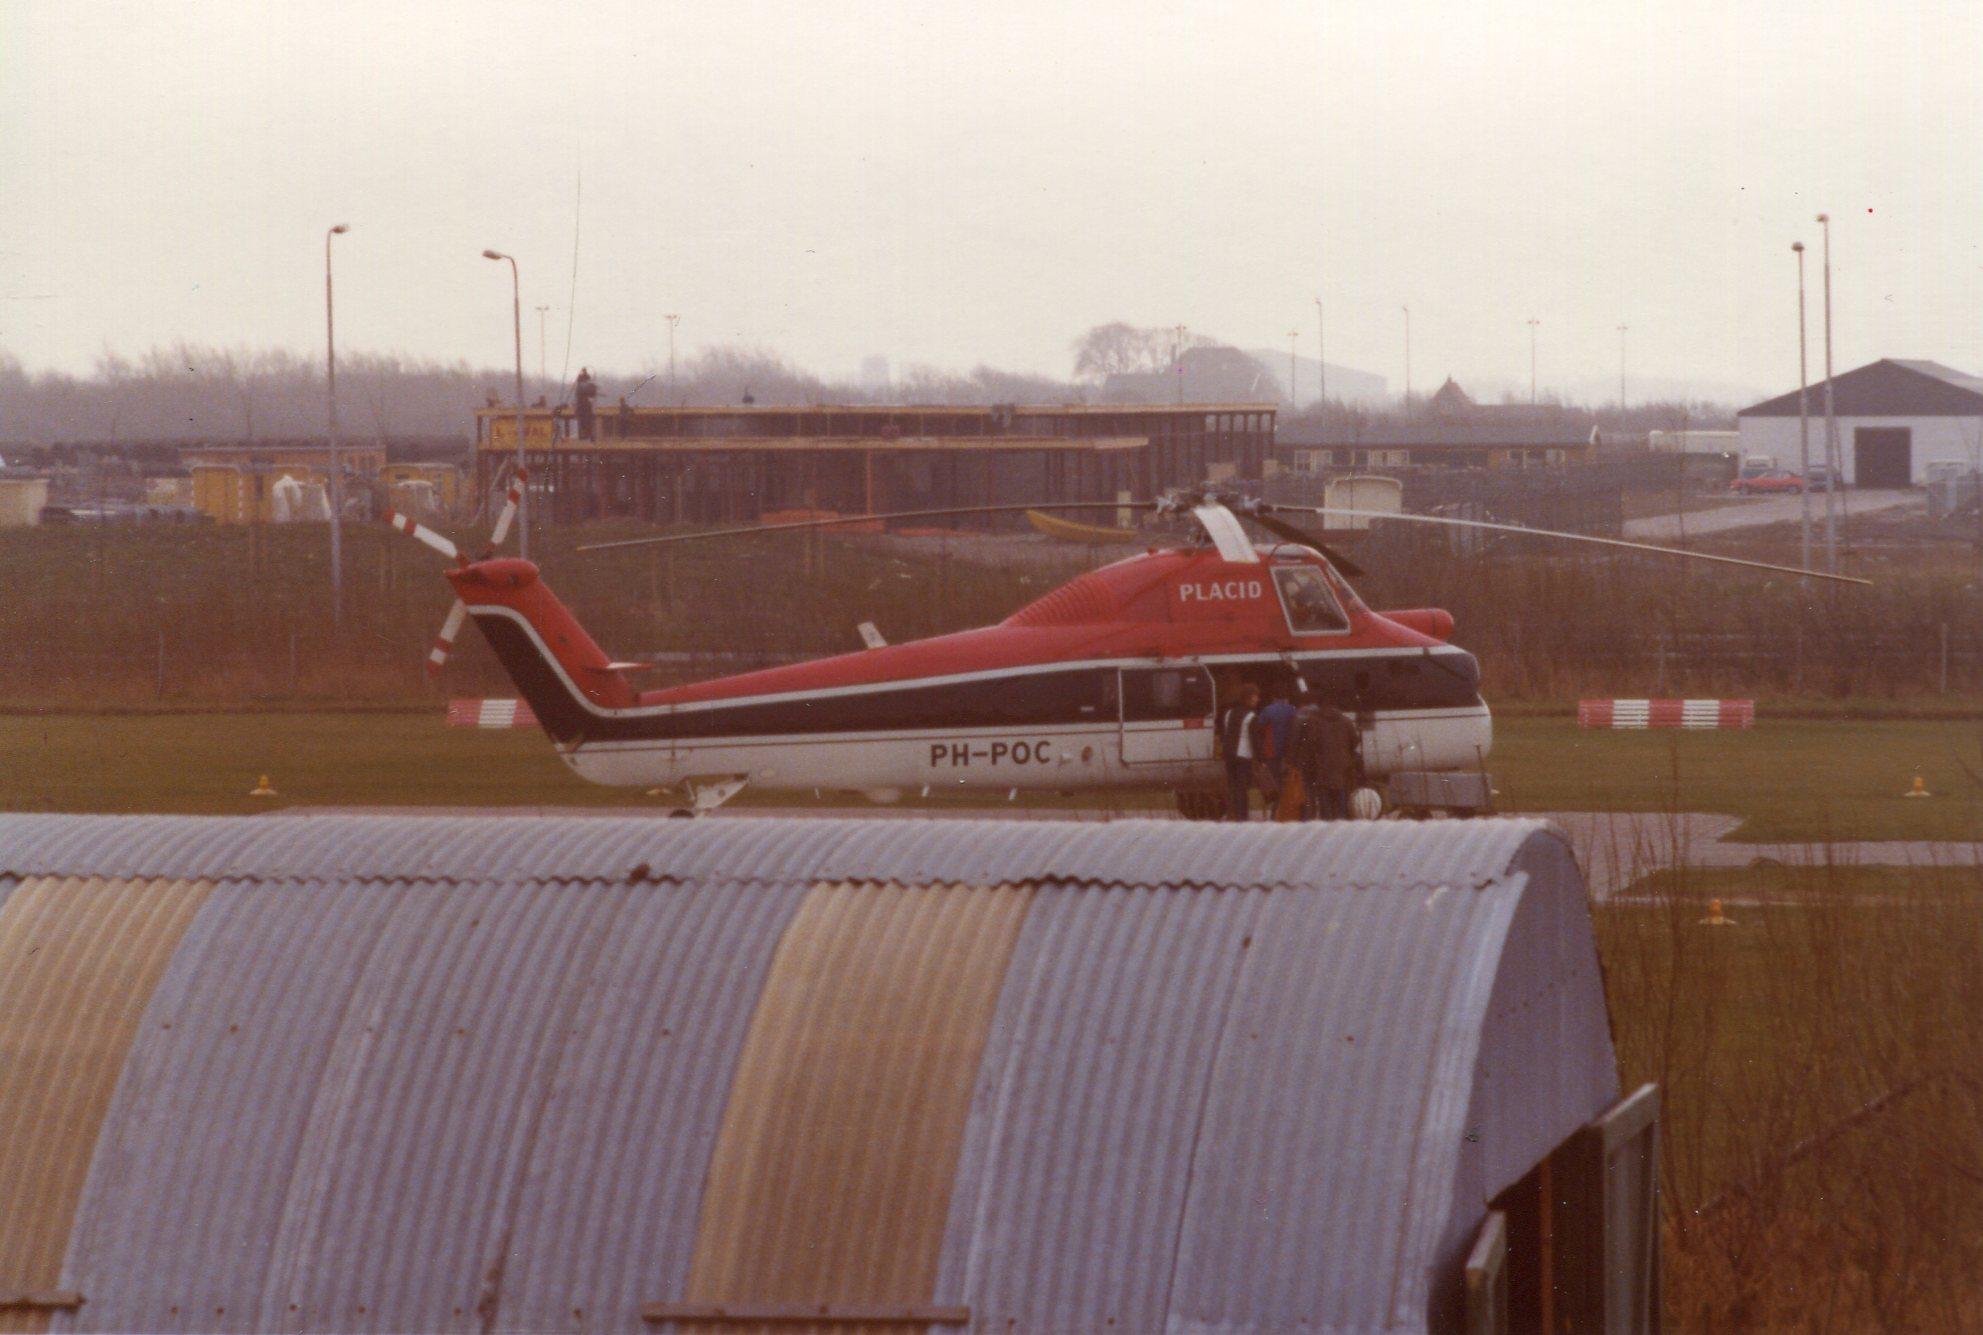 Naam: Den Helder , april 1977 (2).jpg Bekeken: 410 Grootte: 271,9 KB